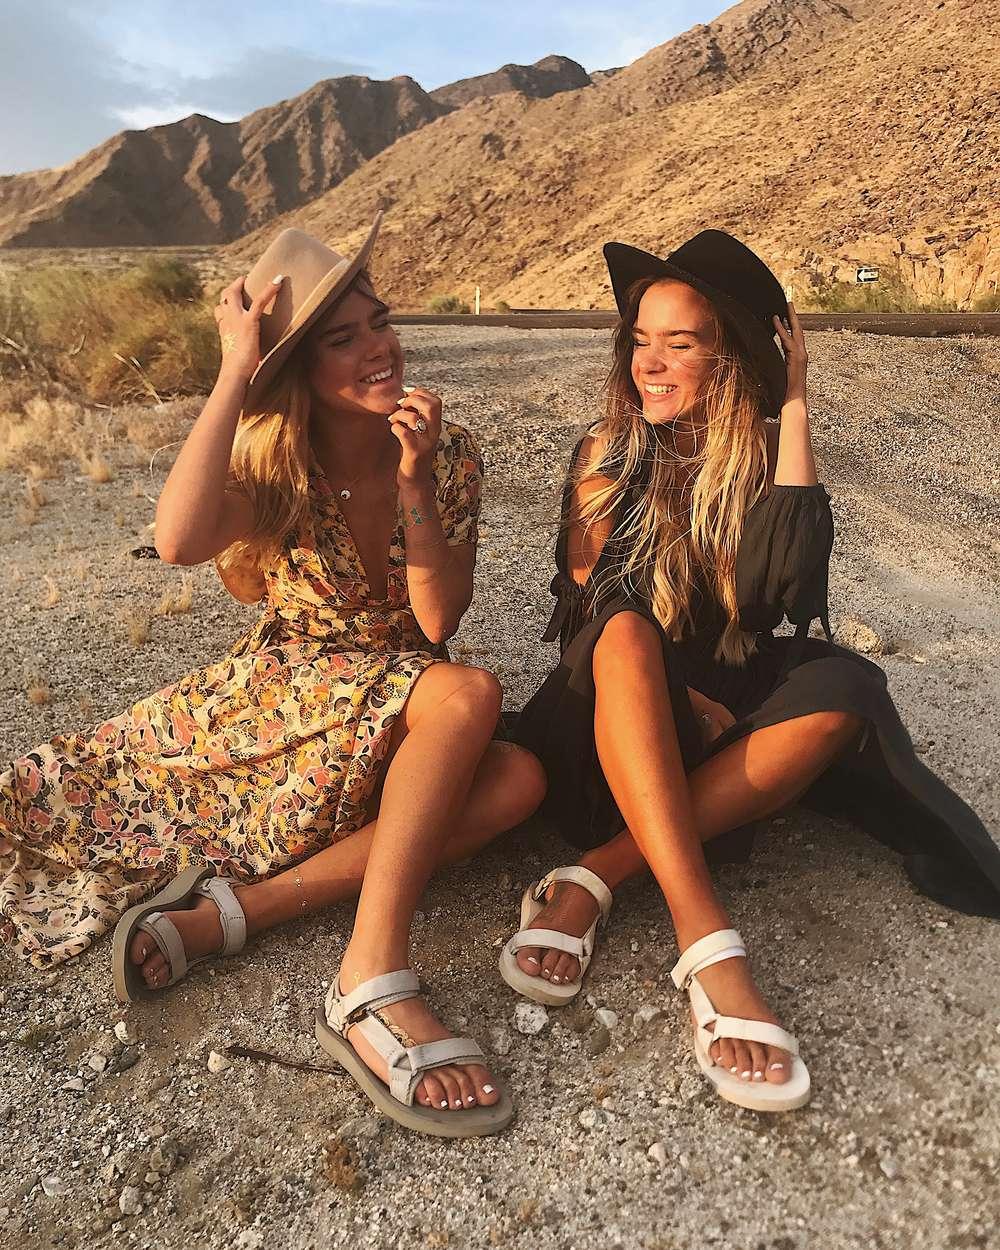 Twins Tess and Sarah Behannon at Coachella